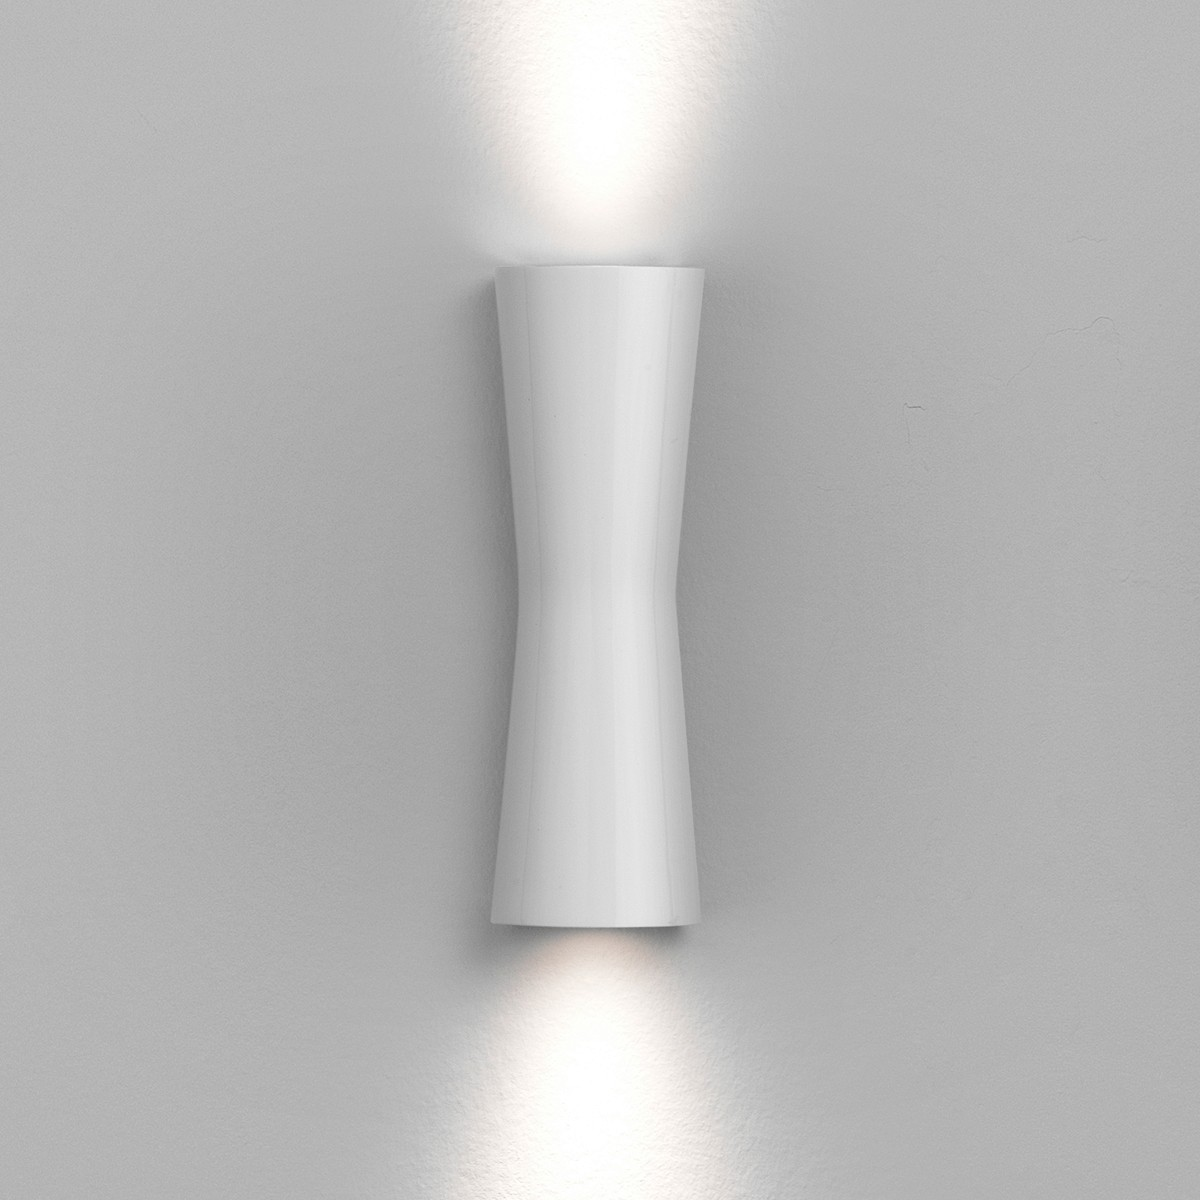 Flos Clessidra LED Wandleuchte, Abstrahlwinkel: 20°+20°, weiß